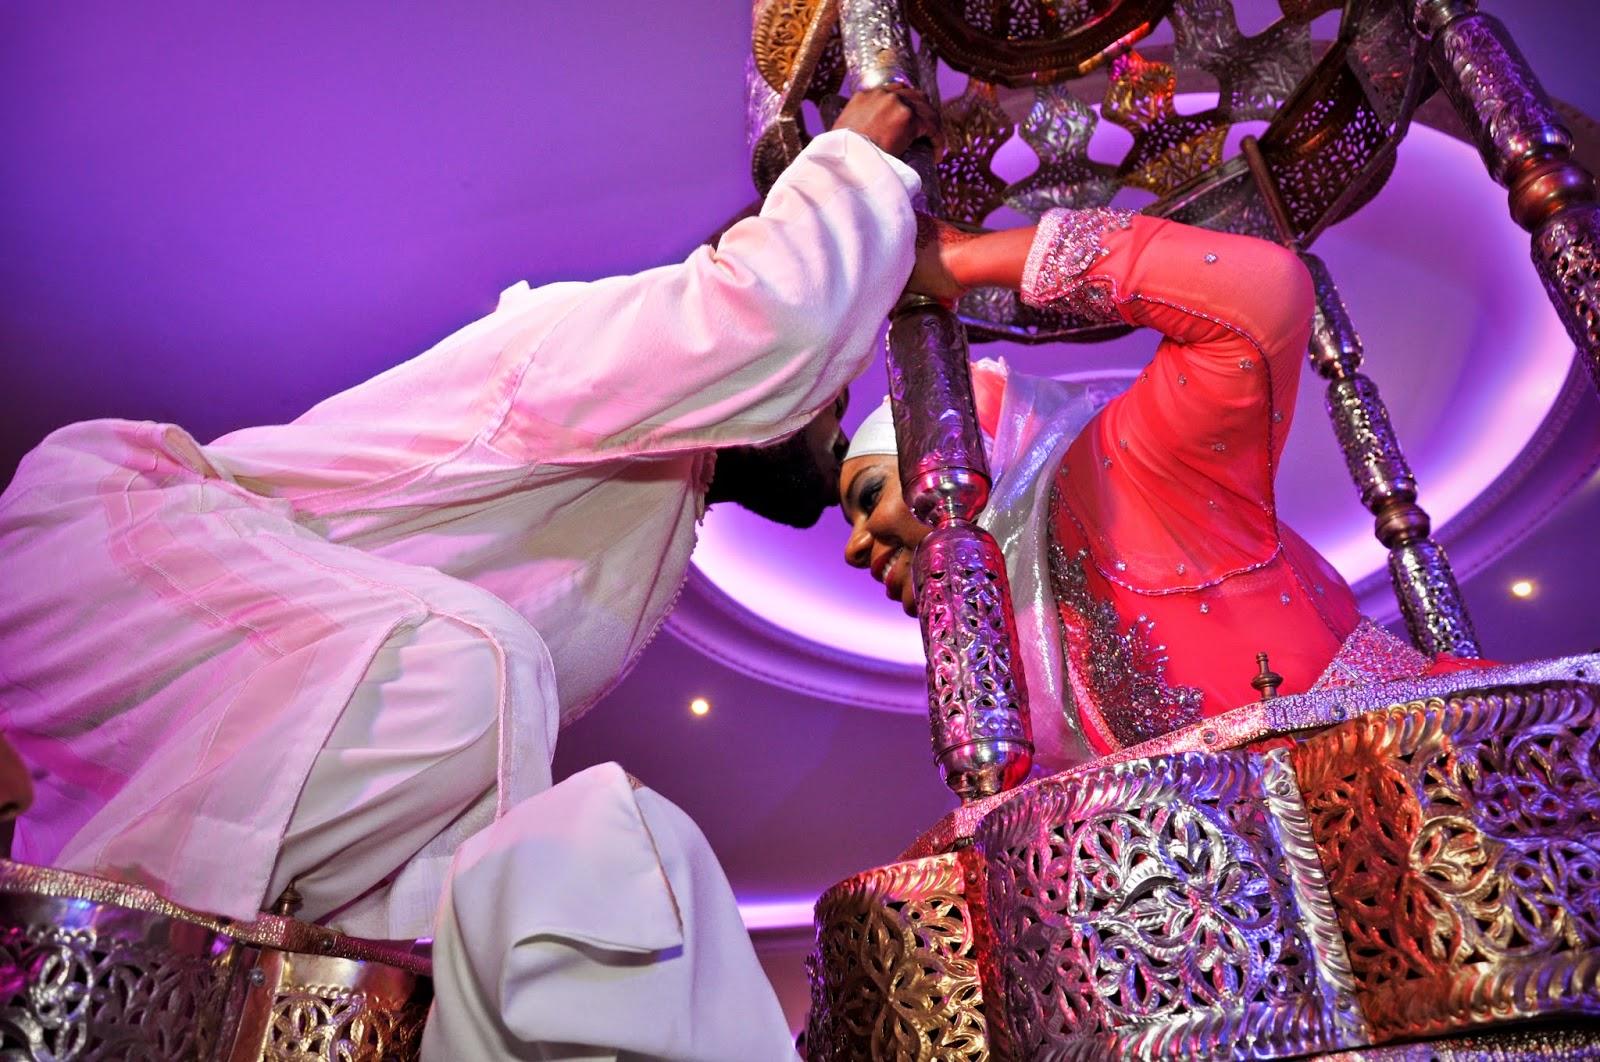 Mariage Mixte Que Dit Vraiment Le Coran 22